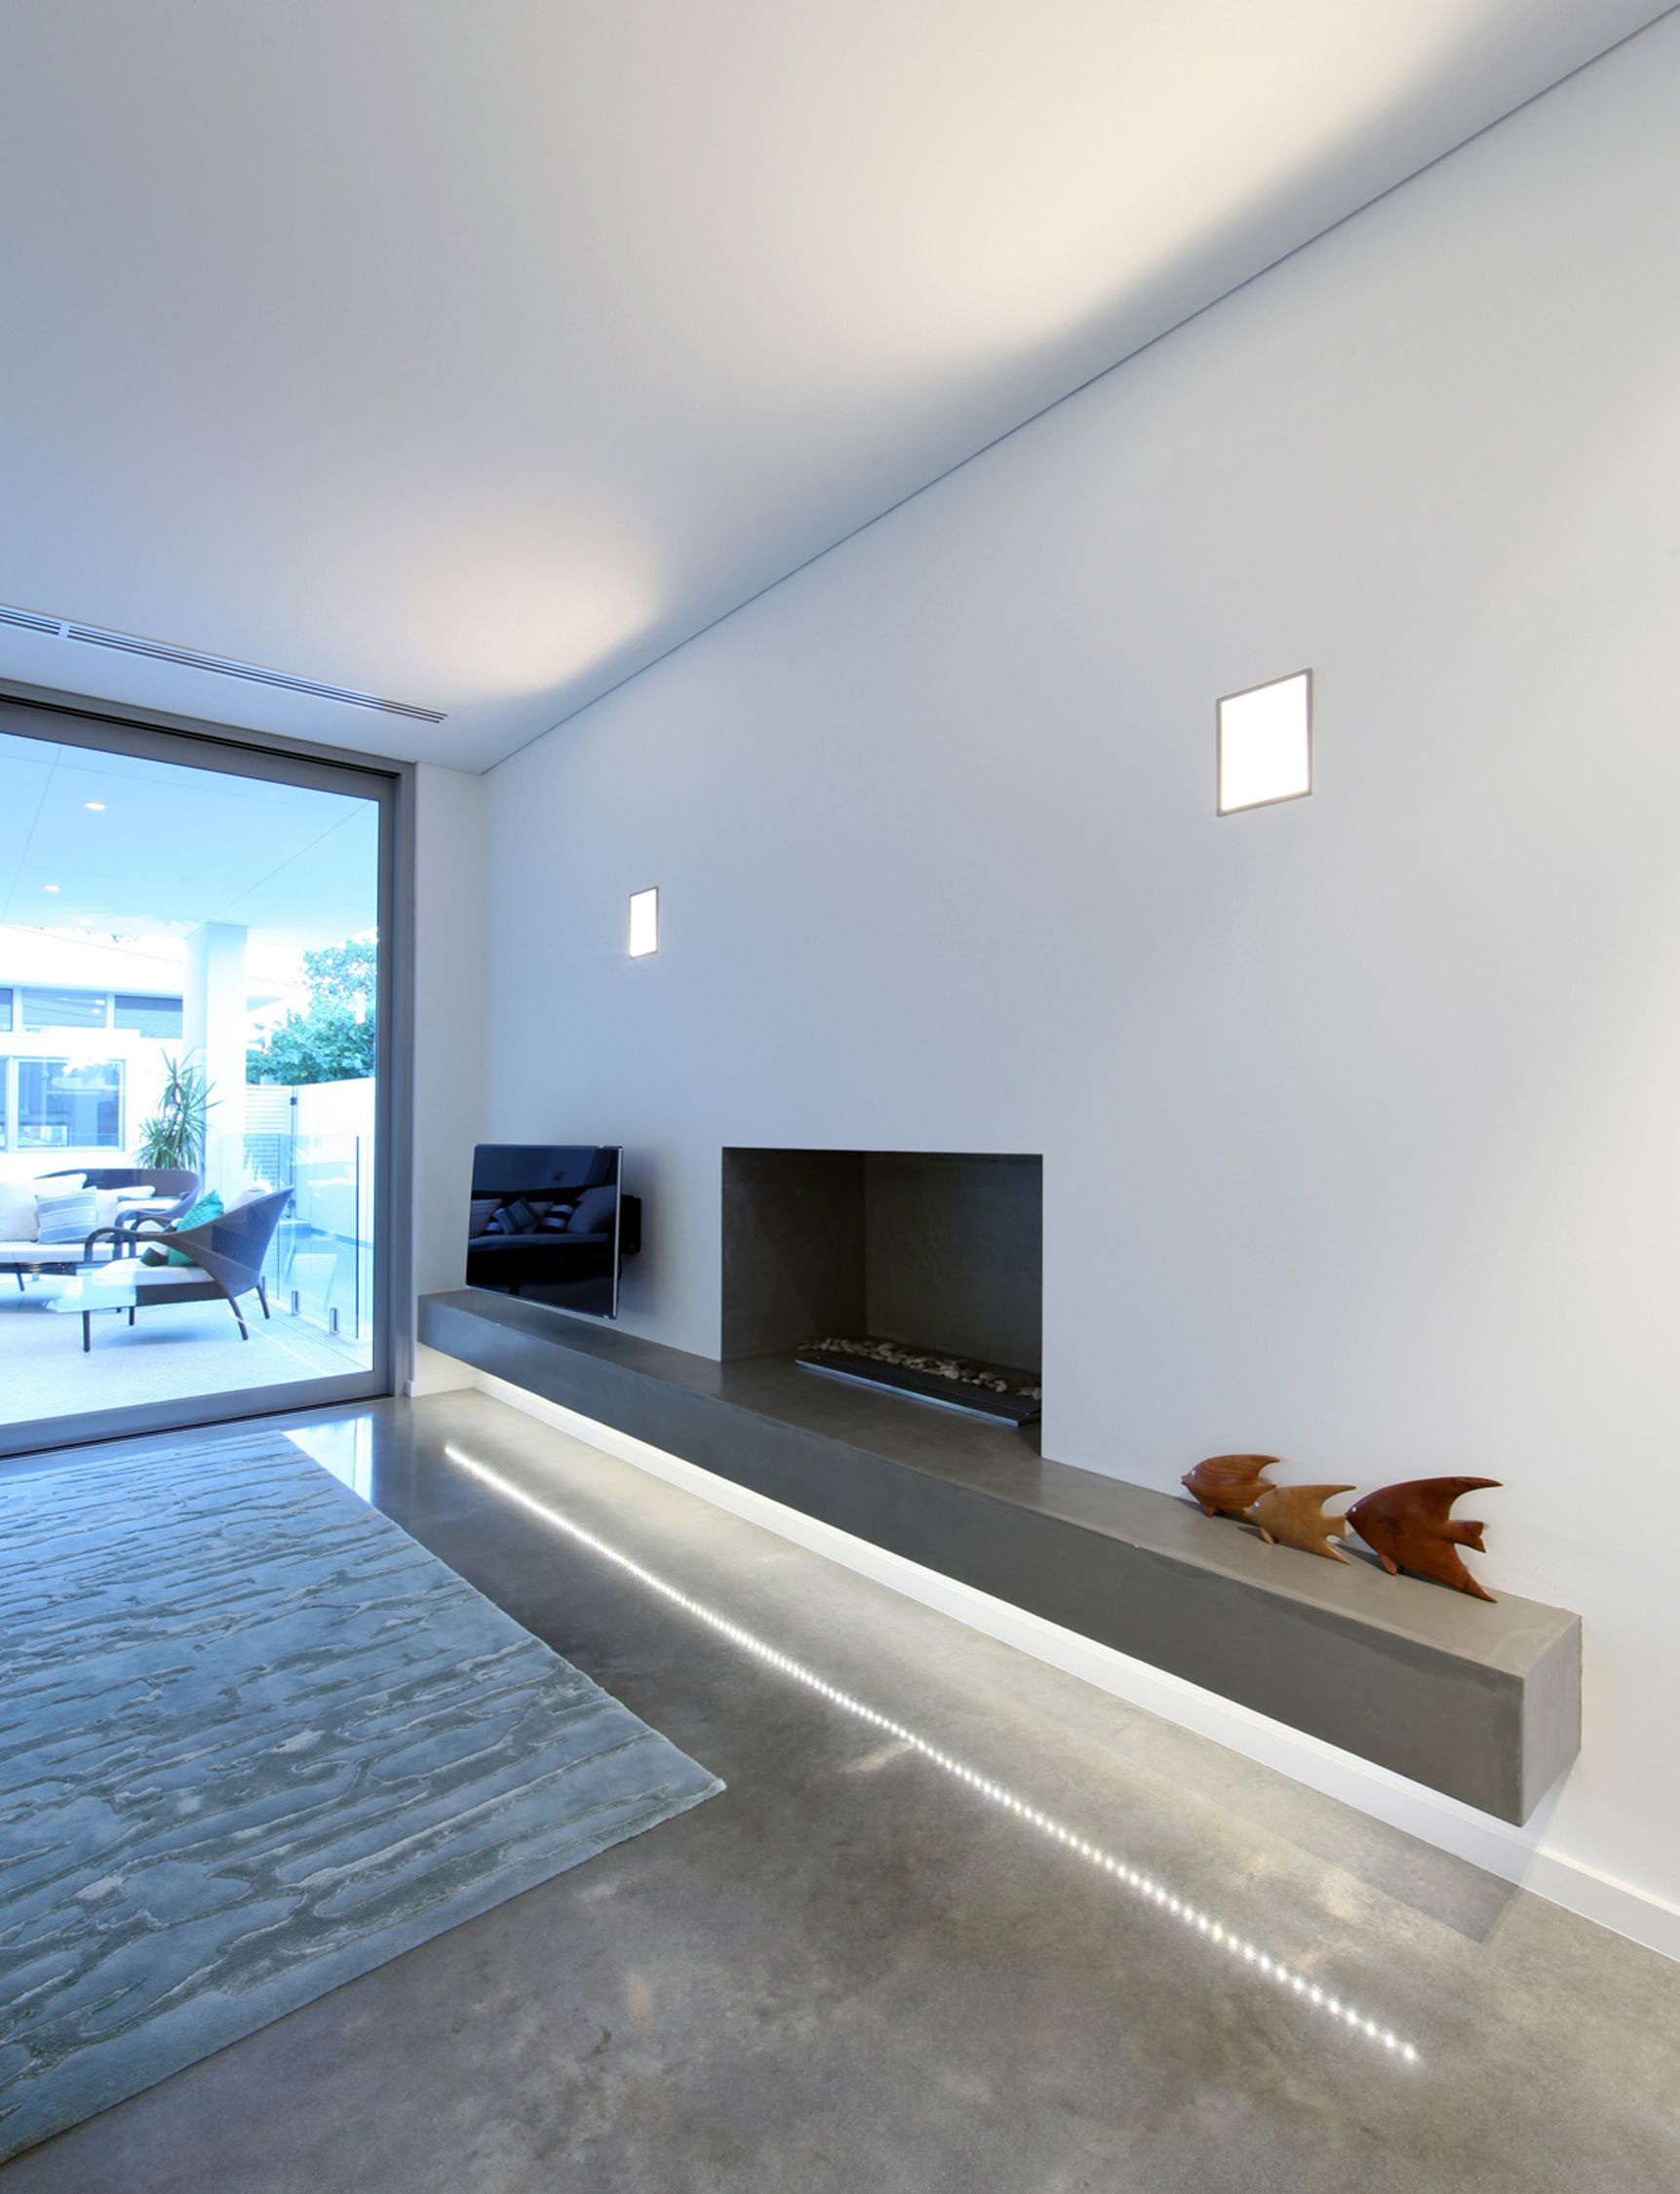 Plinth floor polyurethane - a modern solution for interior decoration